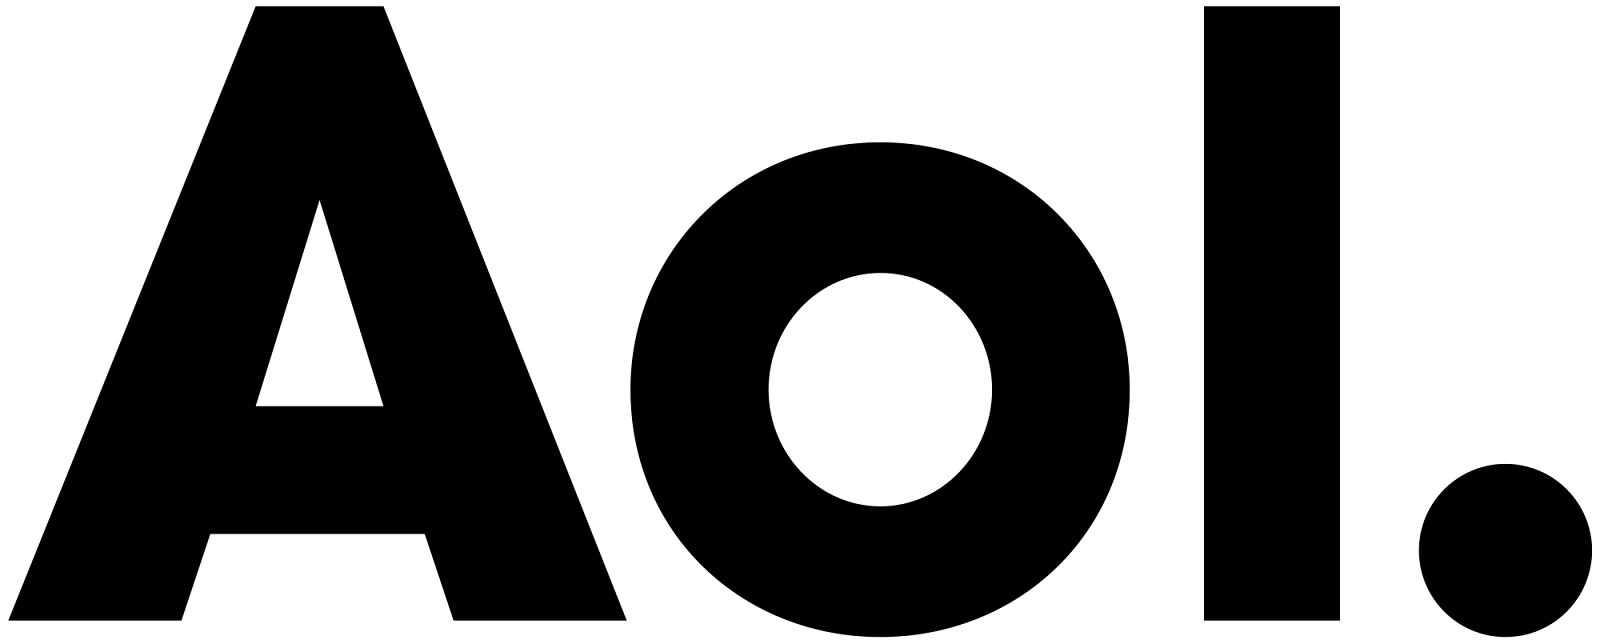 2000px-AOL_logo.svg.png